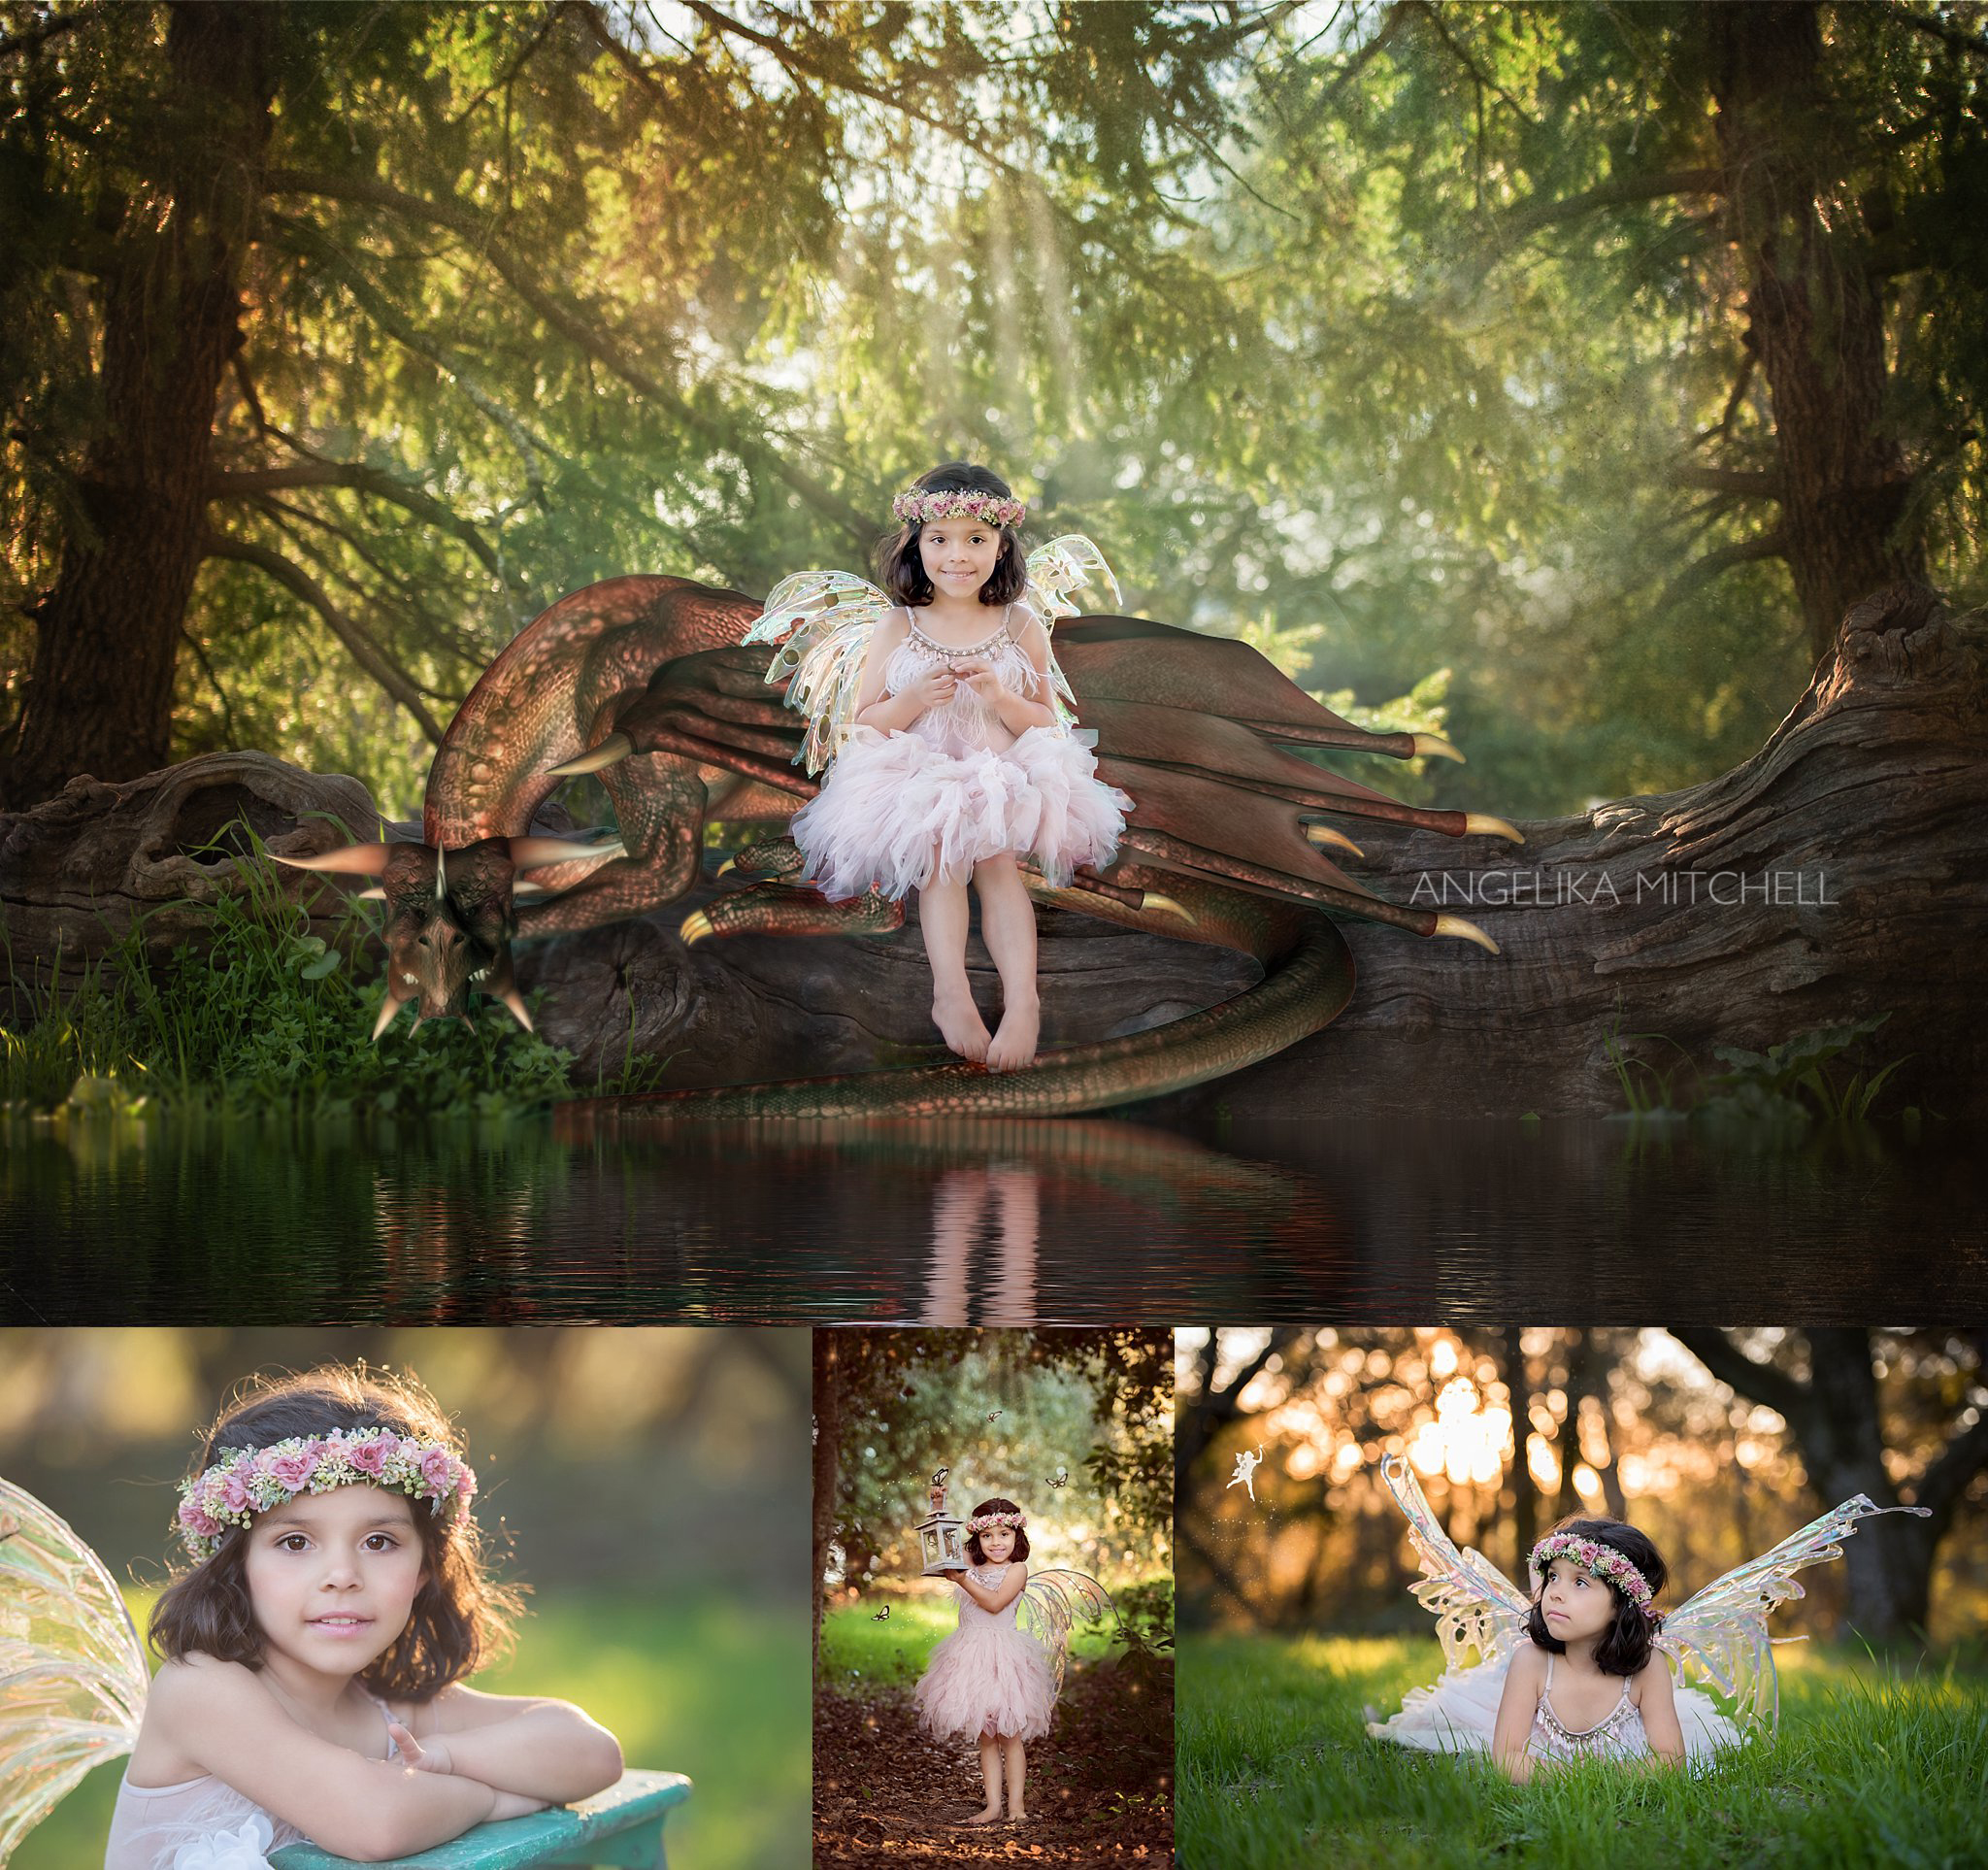 Dragon and girl photo- child photographer angelika mitchell